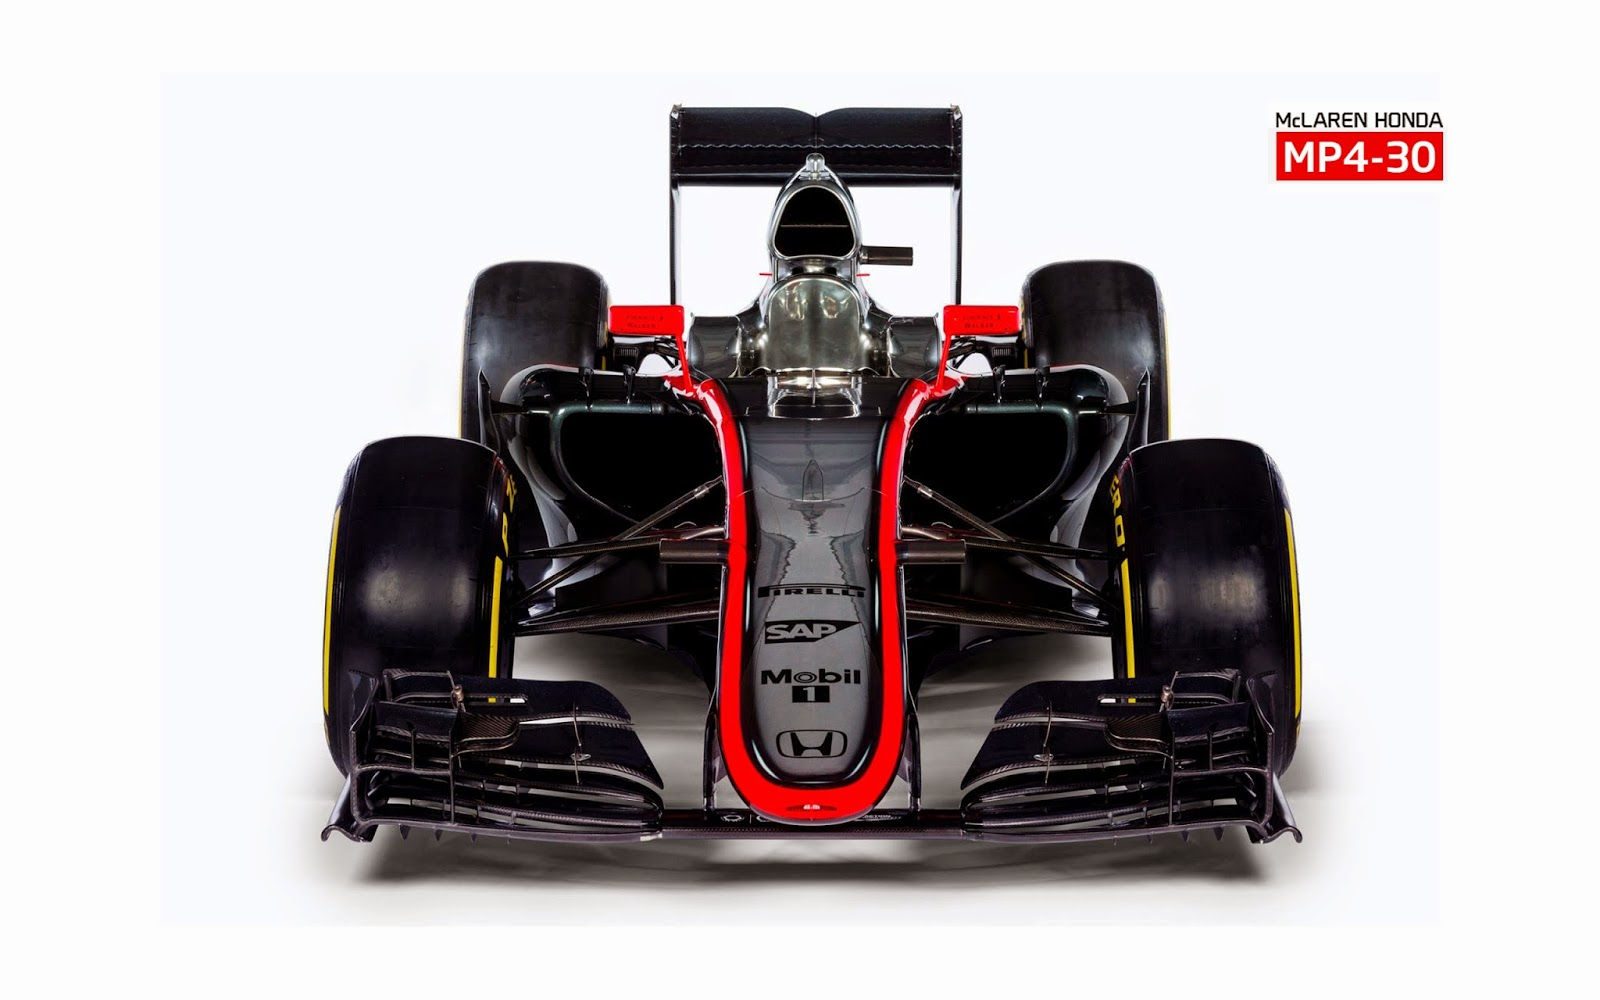 Mclaren F1 Wallpaper Cars Wallpapers